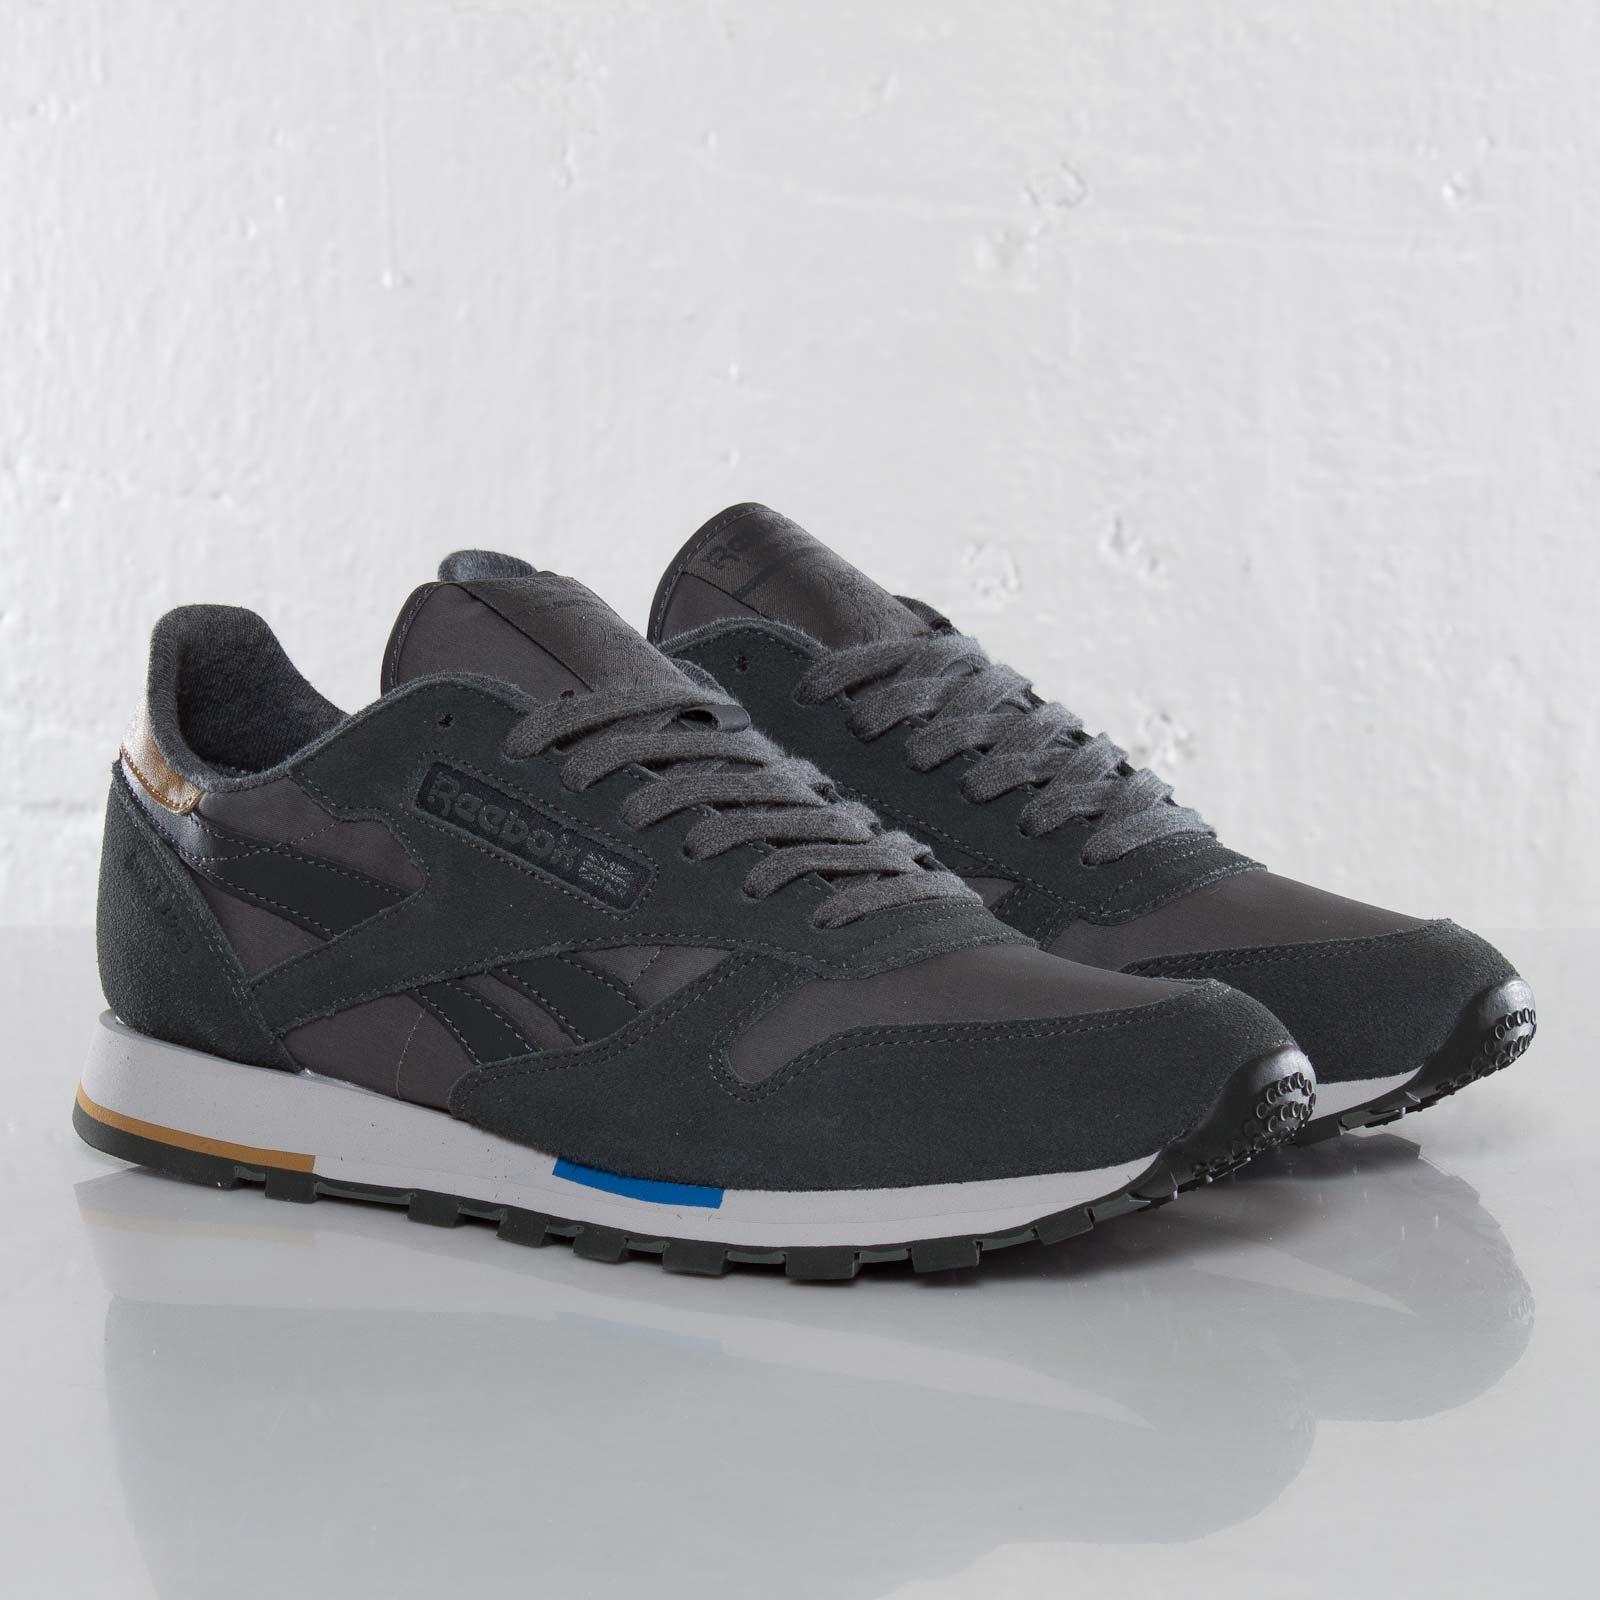 800298f08 Reebok Classic Leather Retro Suede - J97377 - Sneakersnstuff ...